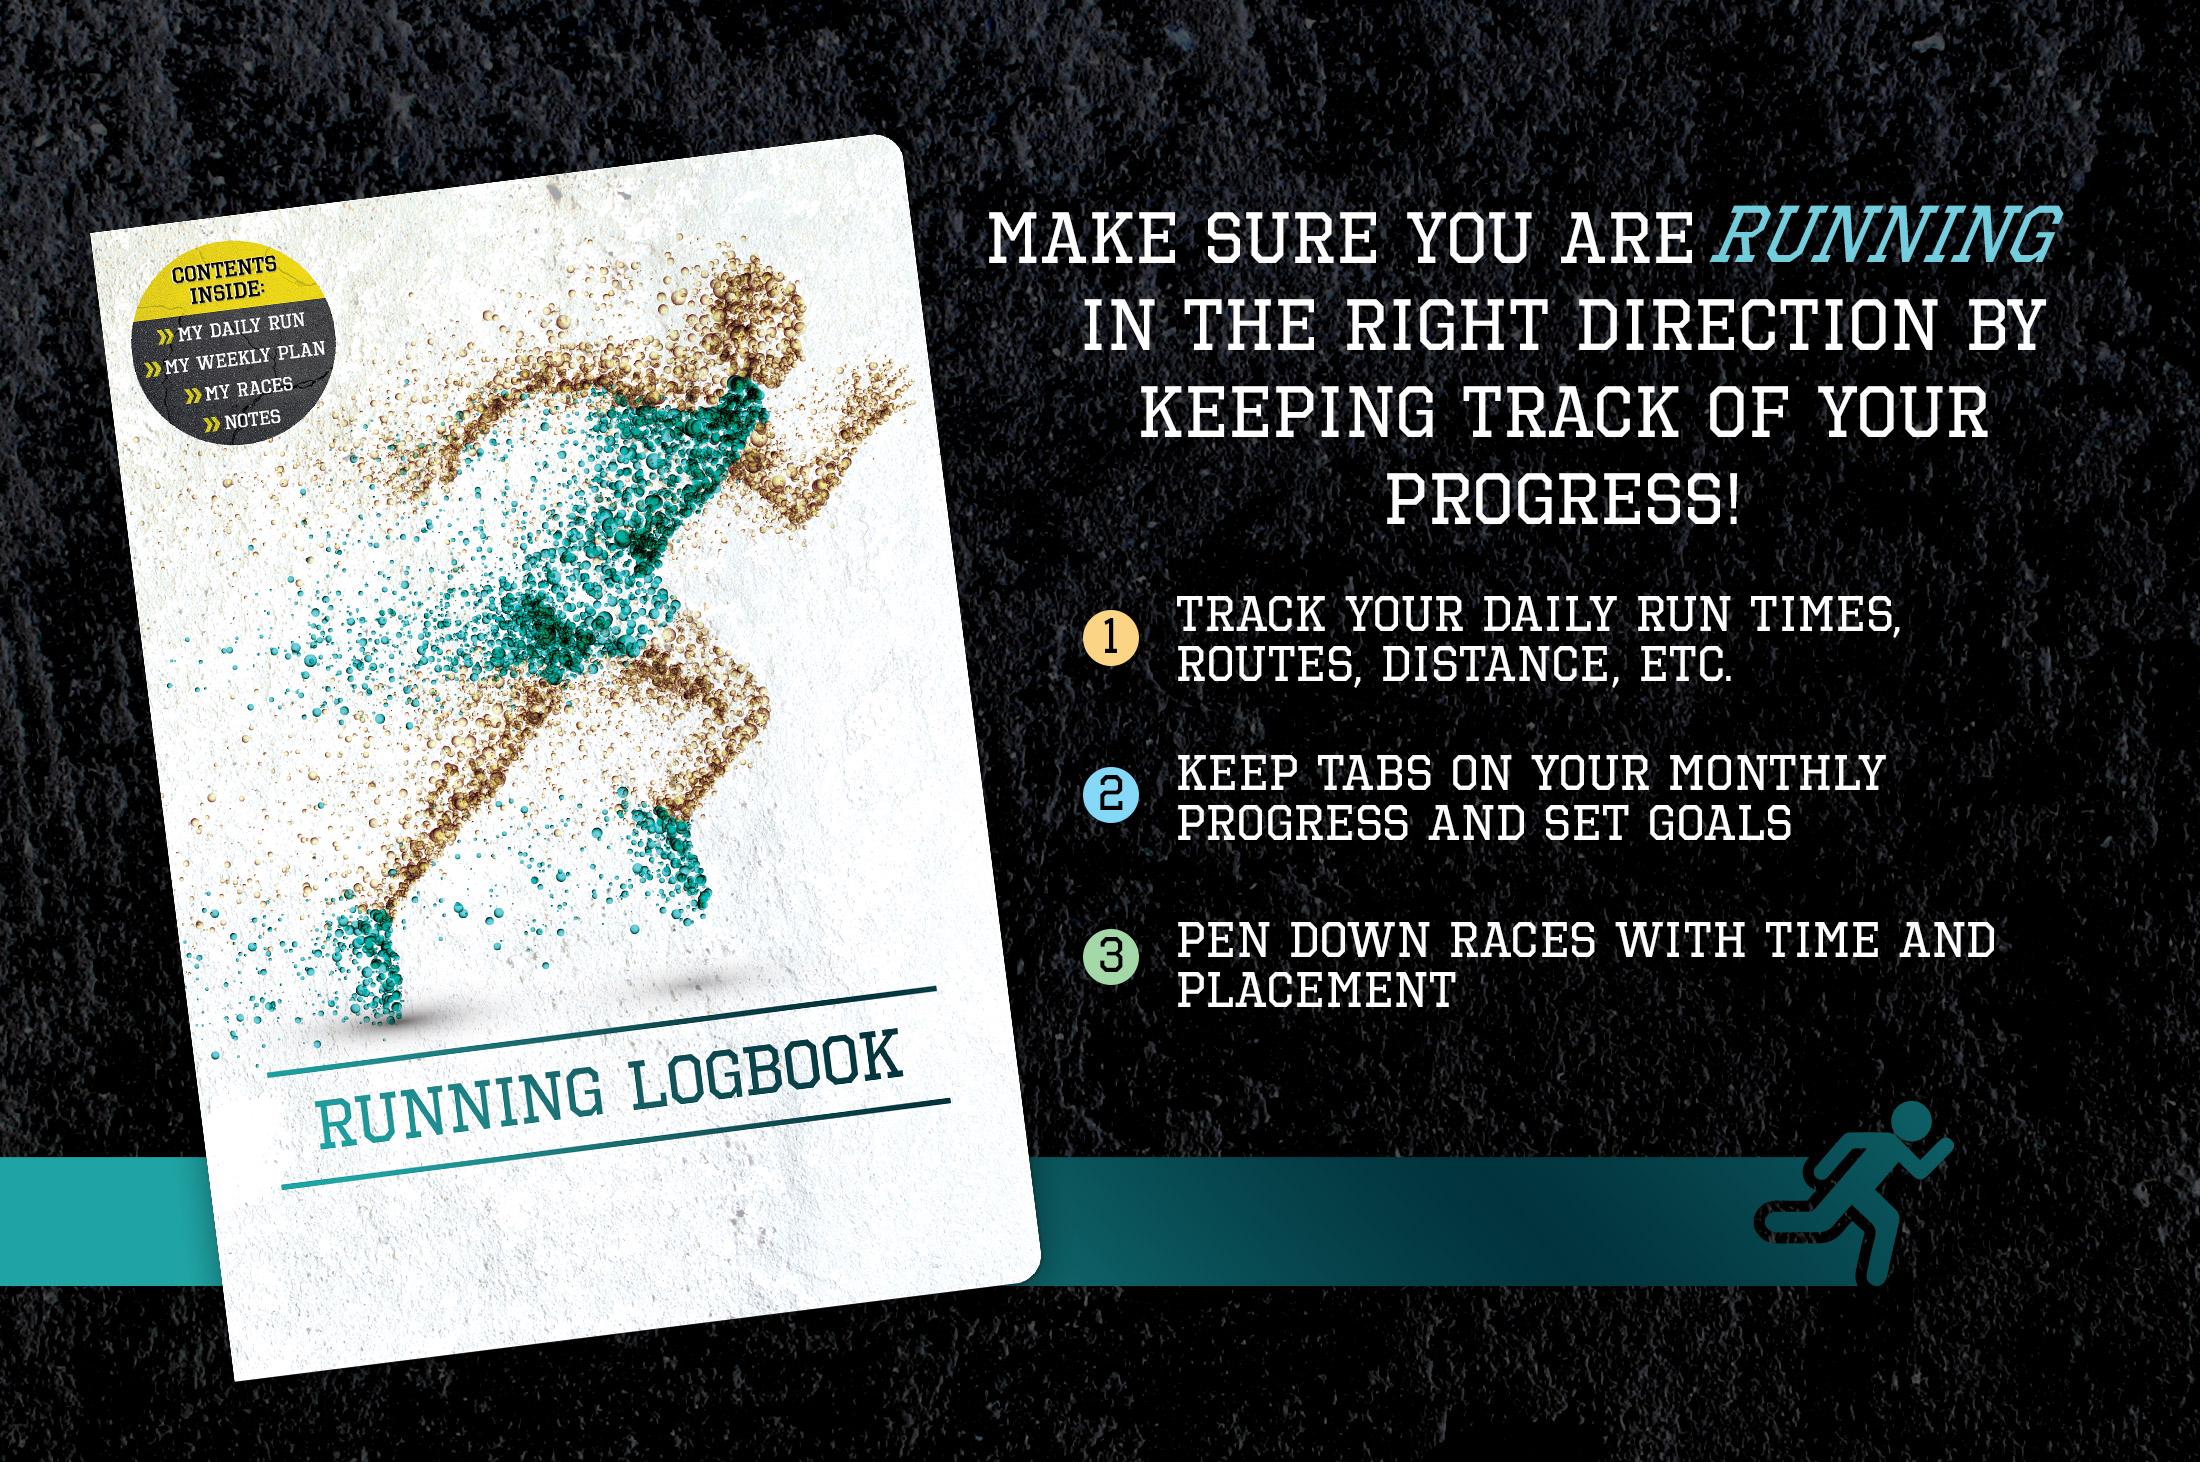 Running_logbook